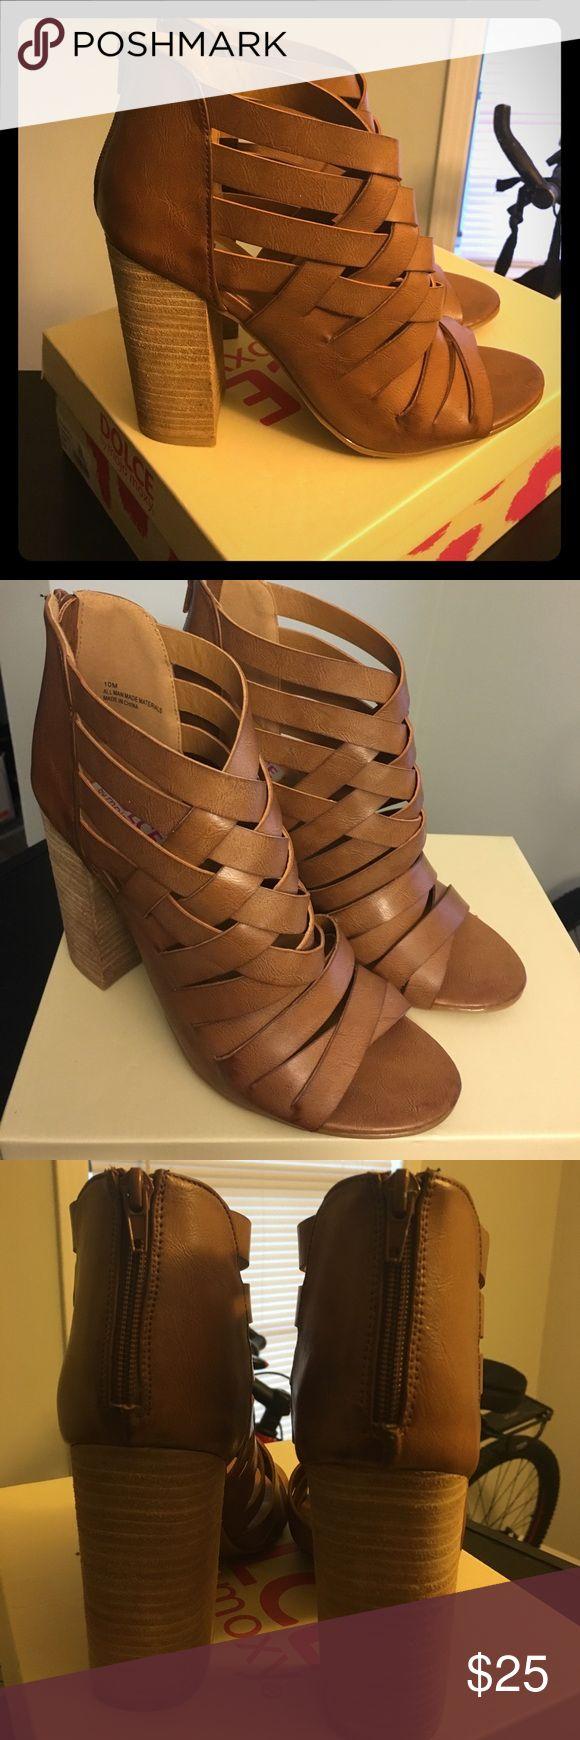 🆕 Dolce by Mojo Moxy Dakota Heeled Sandals🆕 New in box. Size 10. Dakota style name. Cognac color. Strappy. Zip up back. Mojo Moxy Shoes Sandals